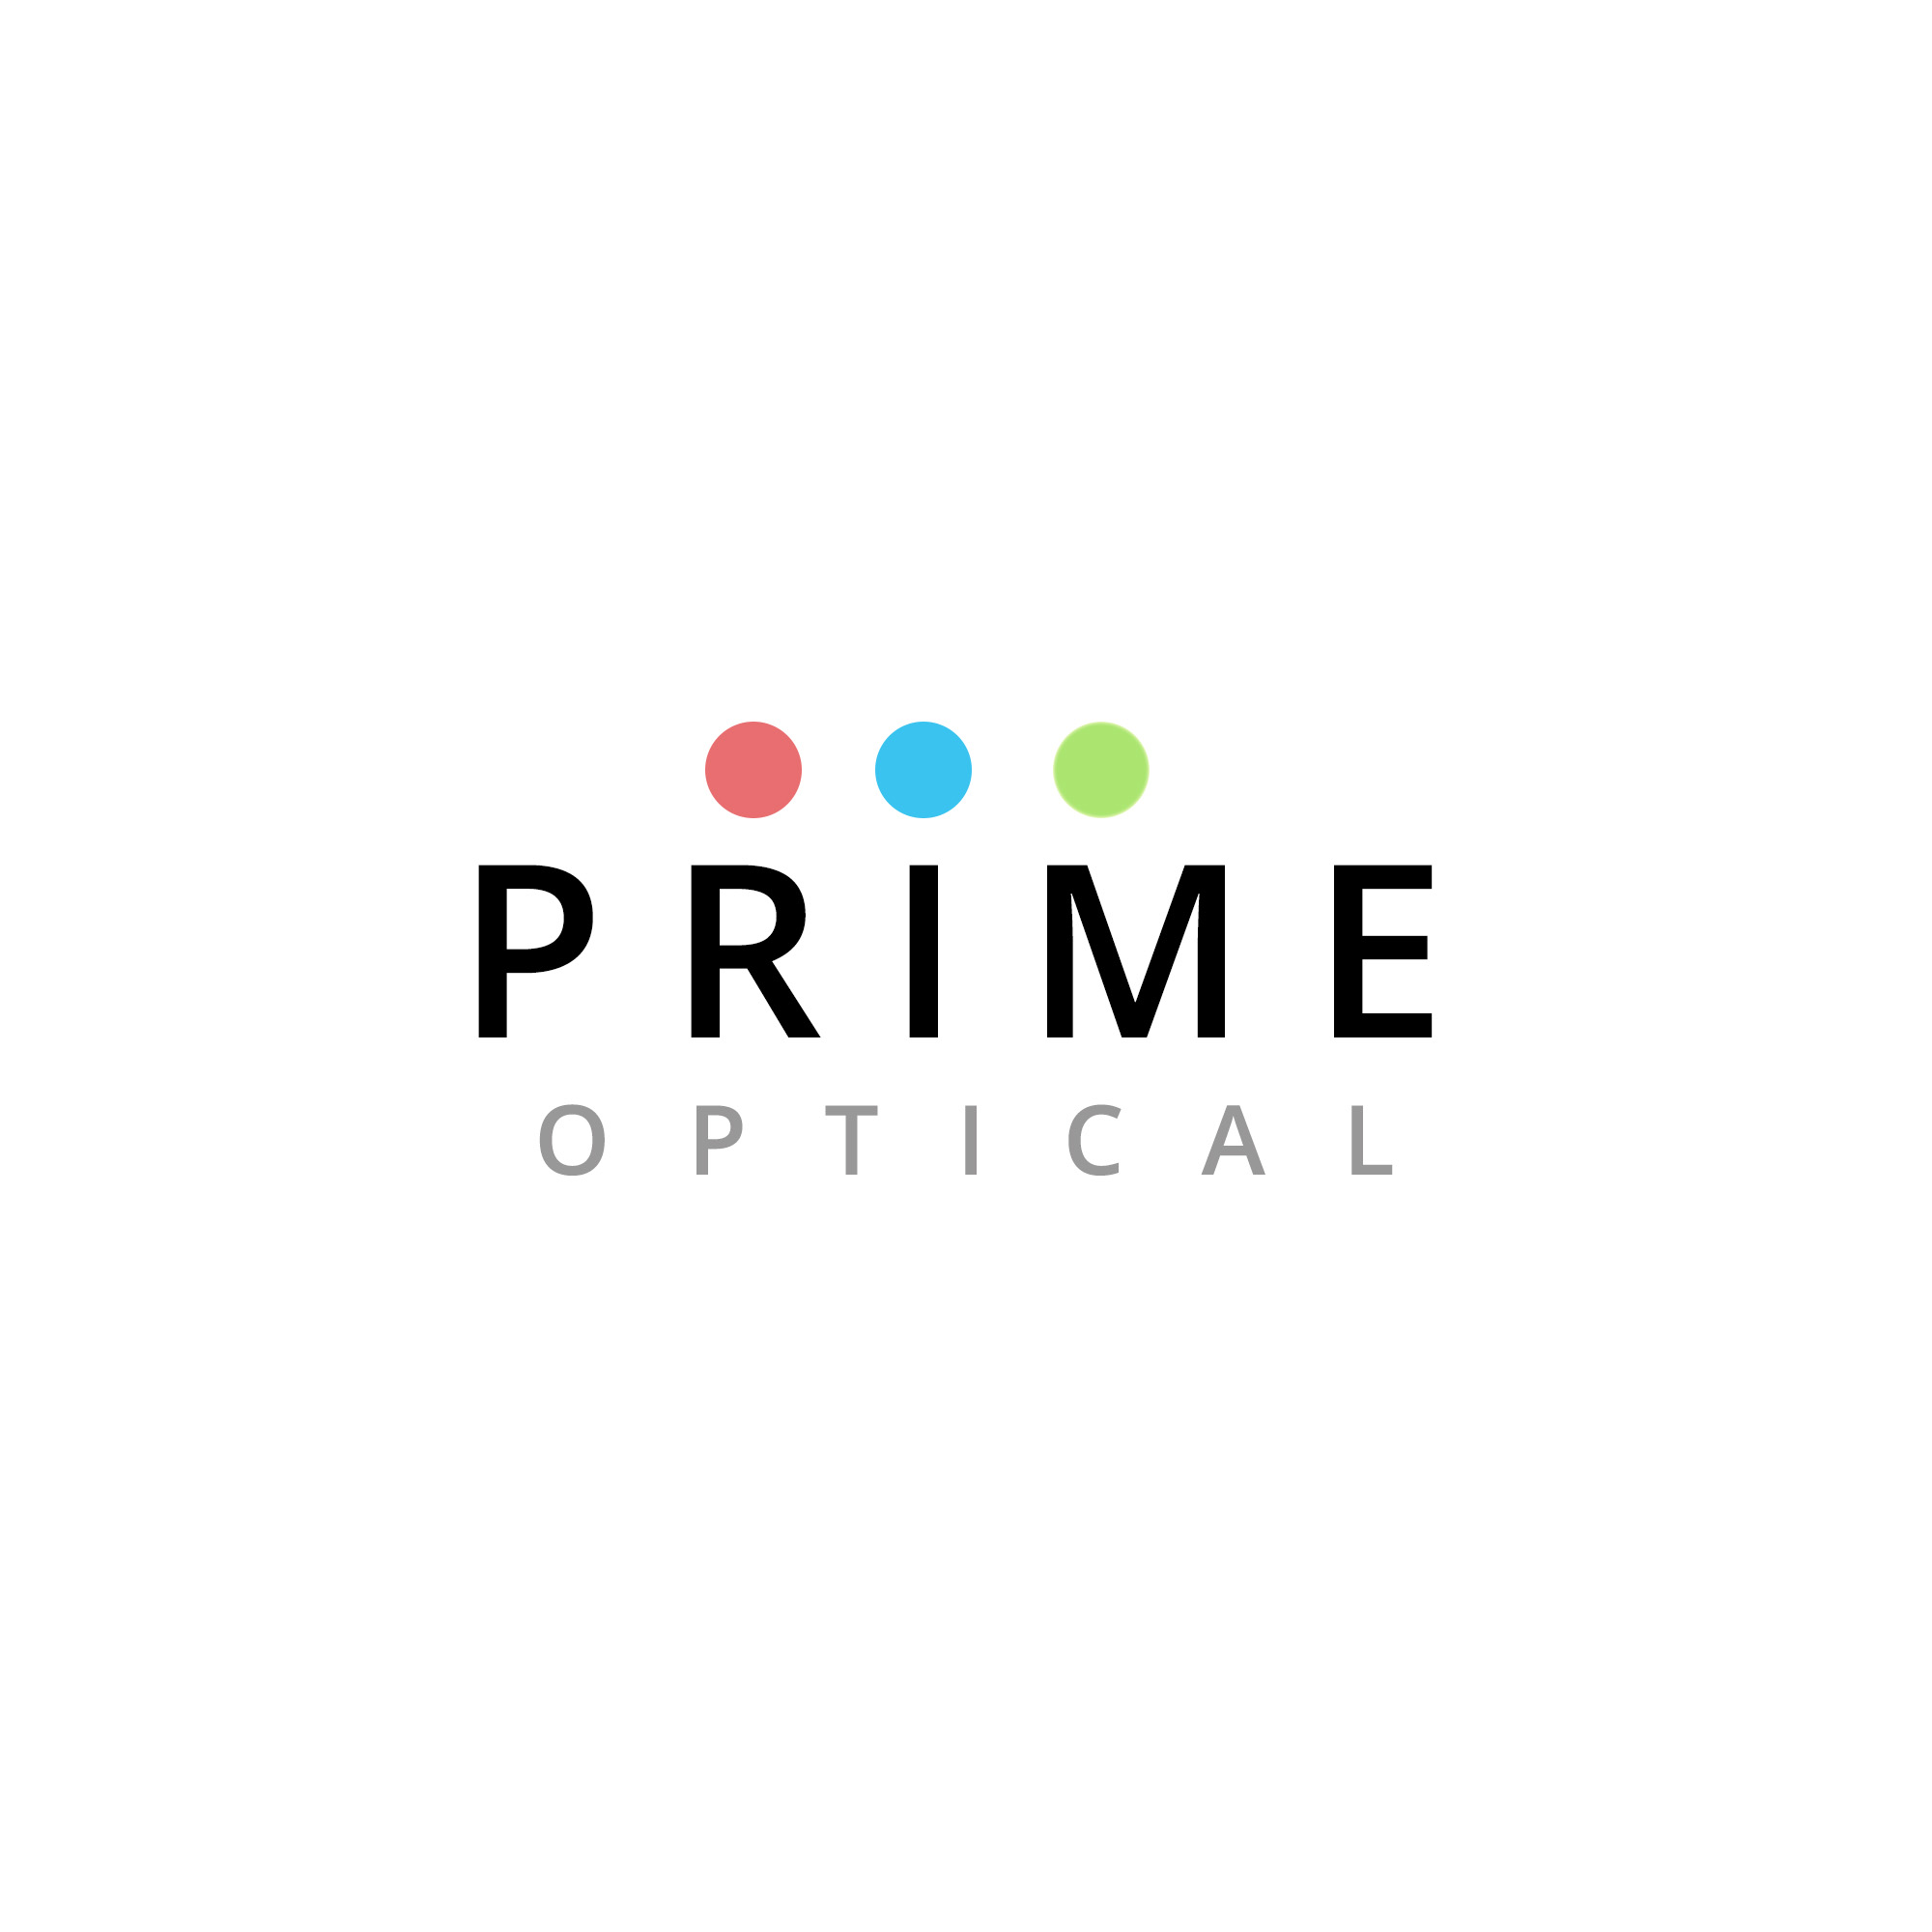 Prime Optical